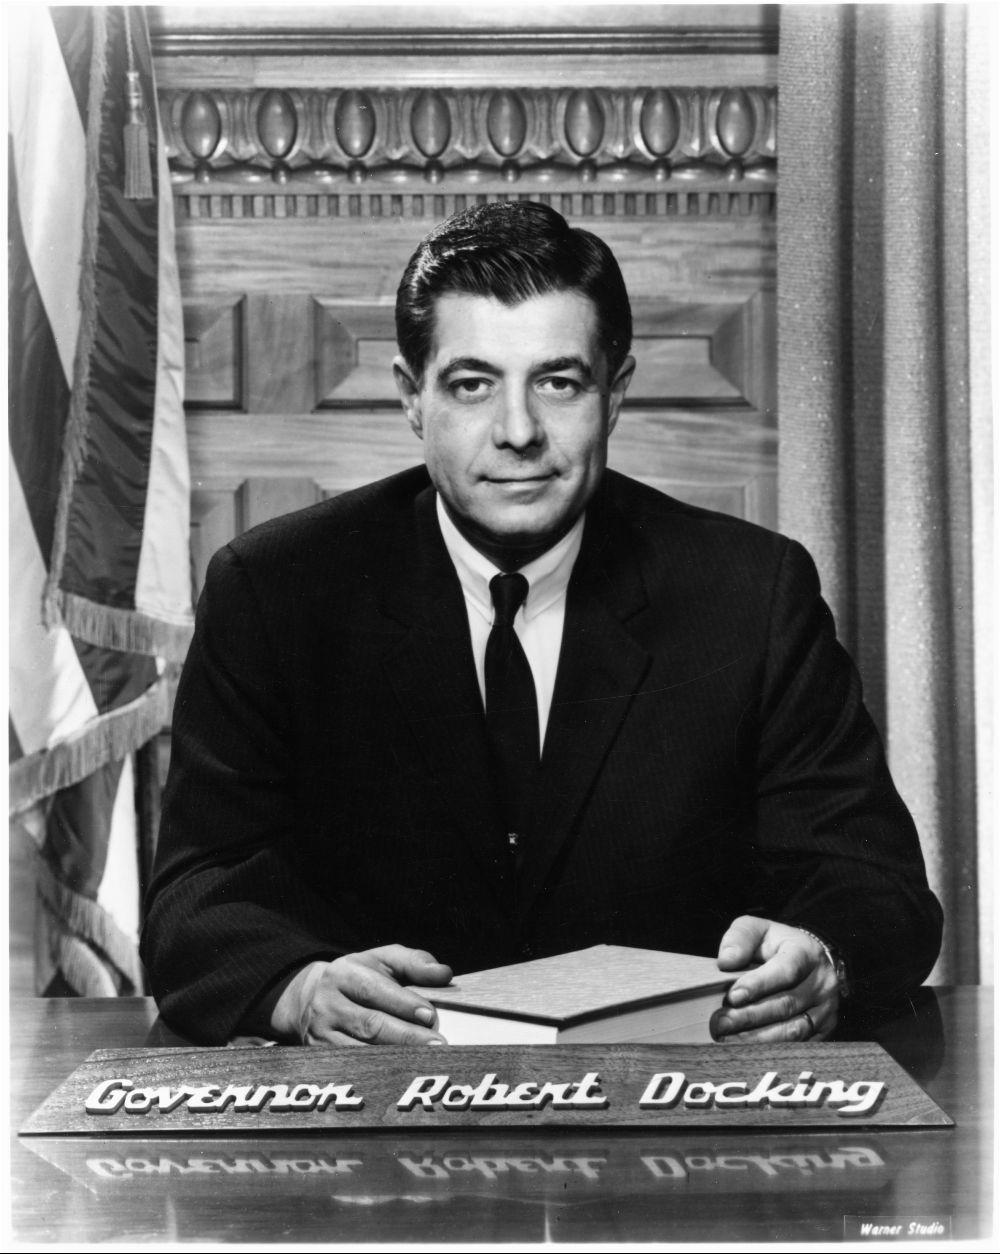 Robert Blackwell Docking